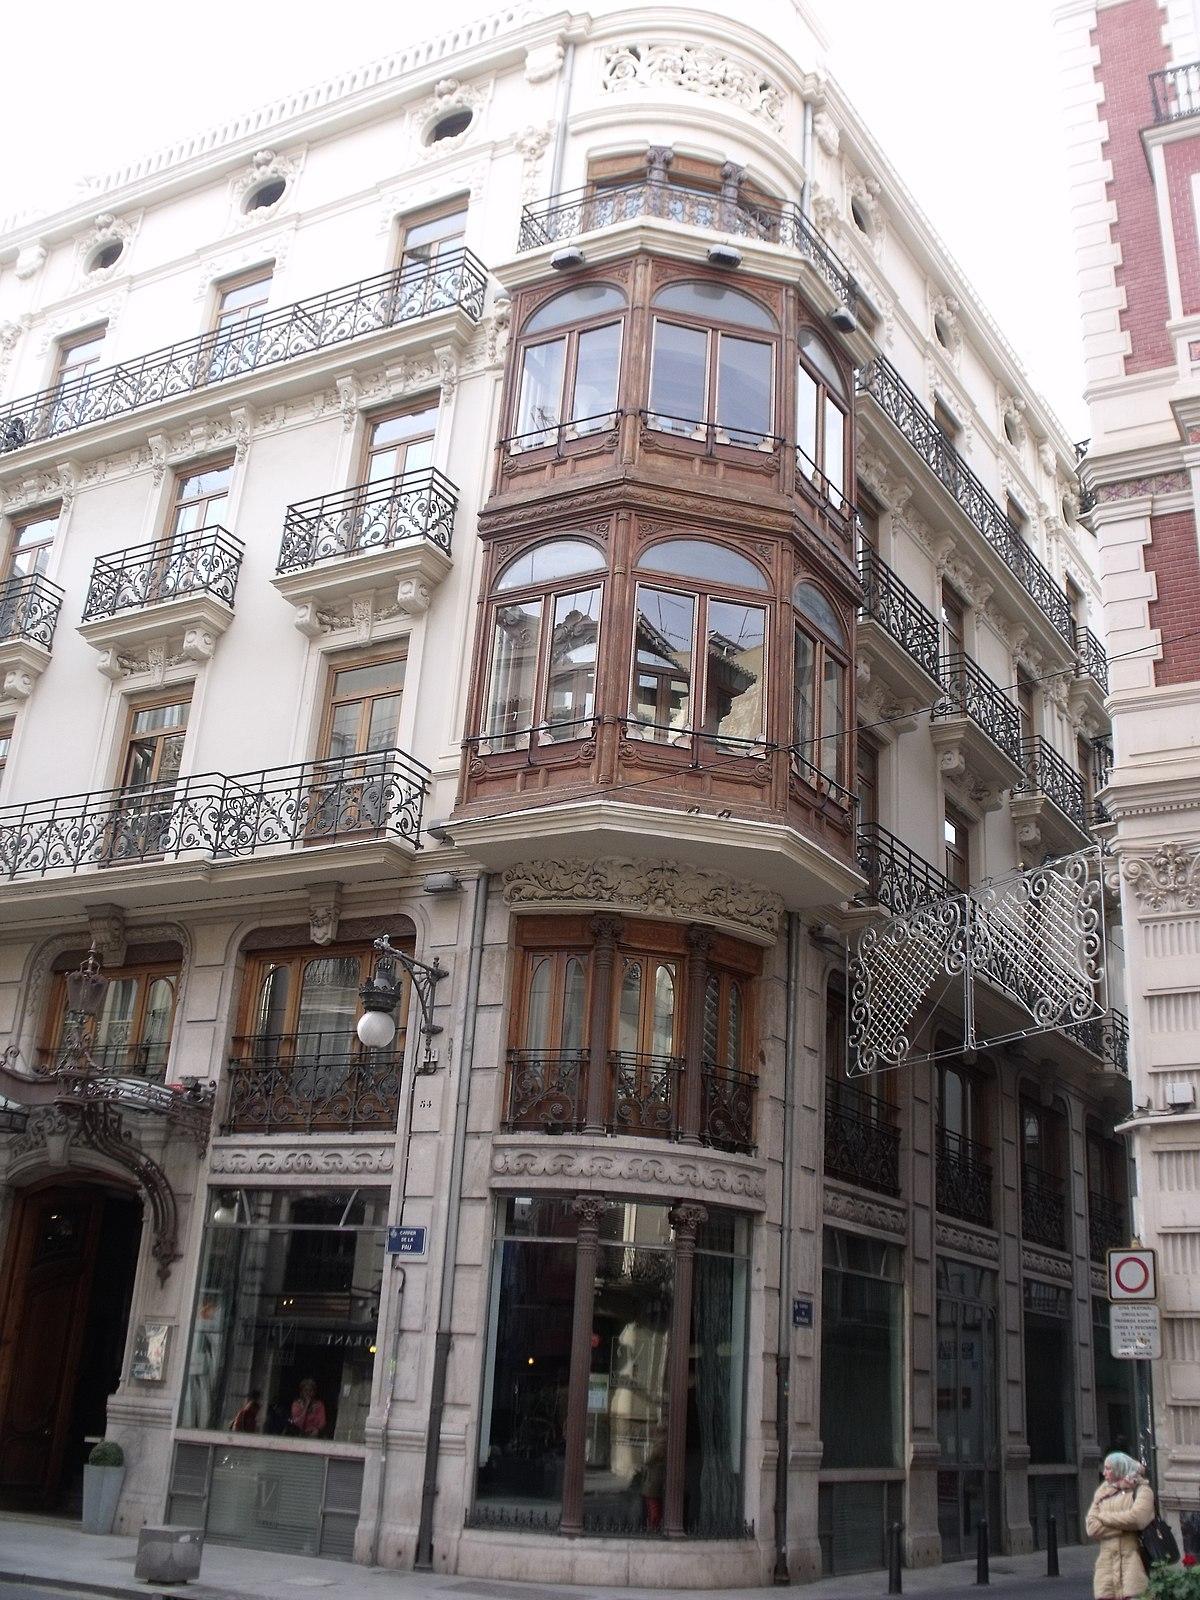 Hotel palace valencia wikipedia la enciclopedia libre for Hotel diseno valencia